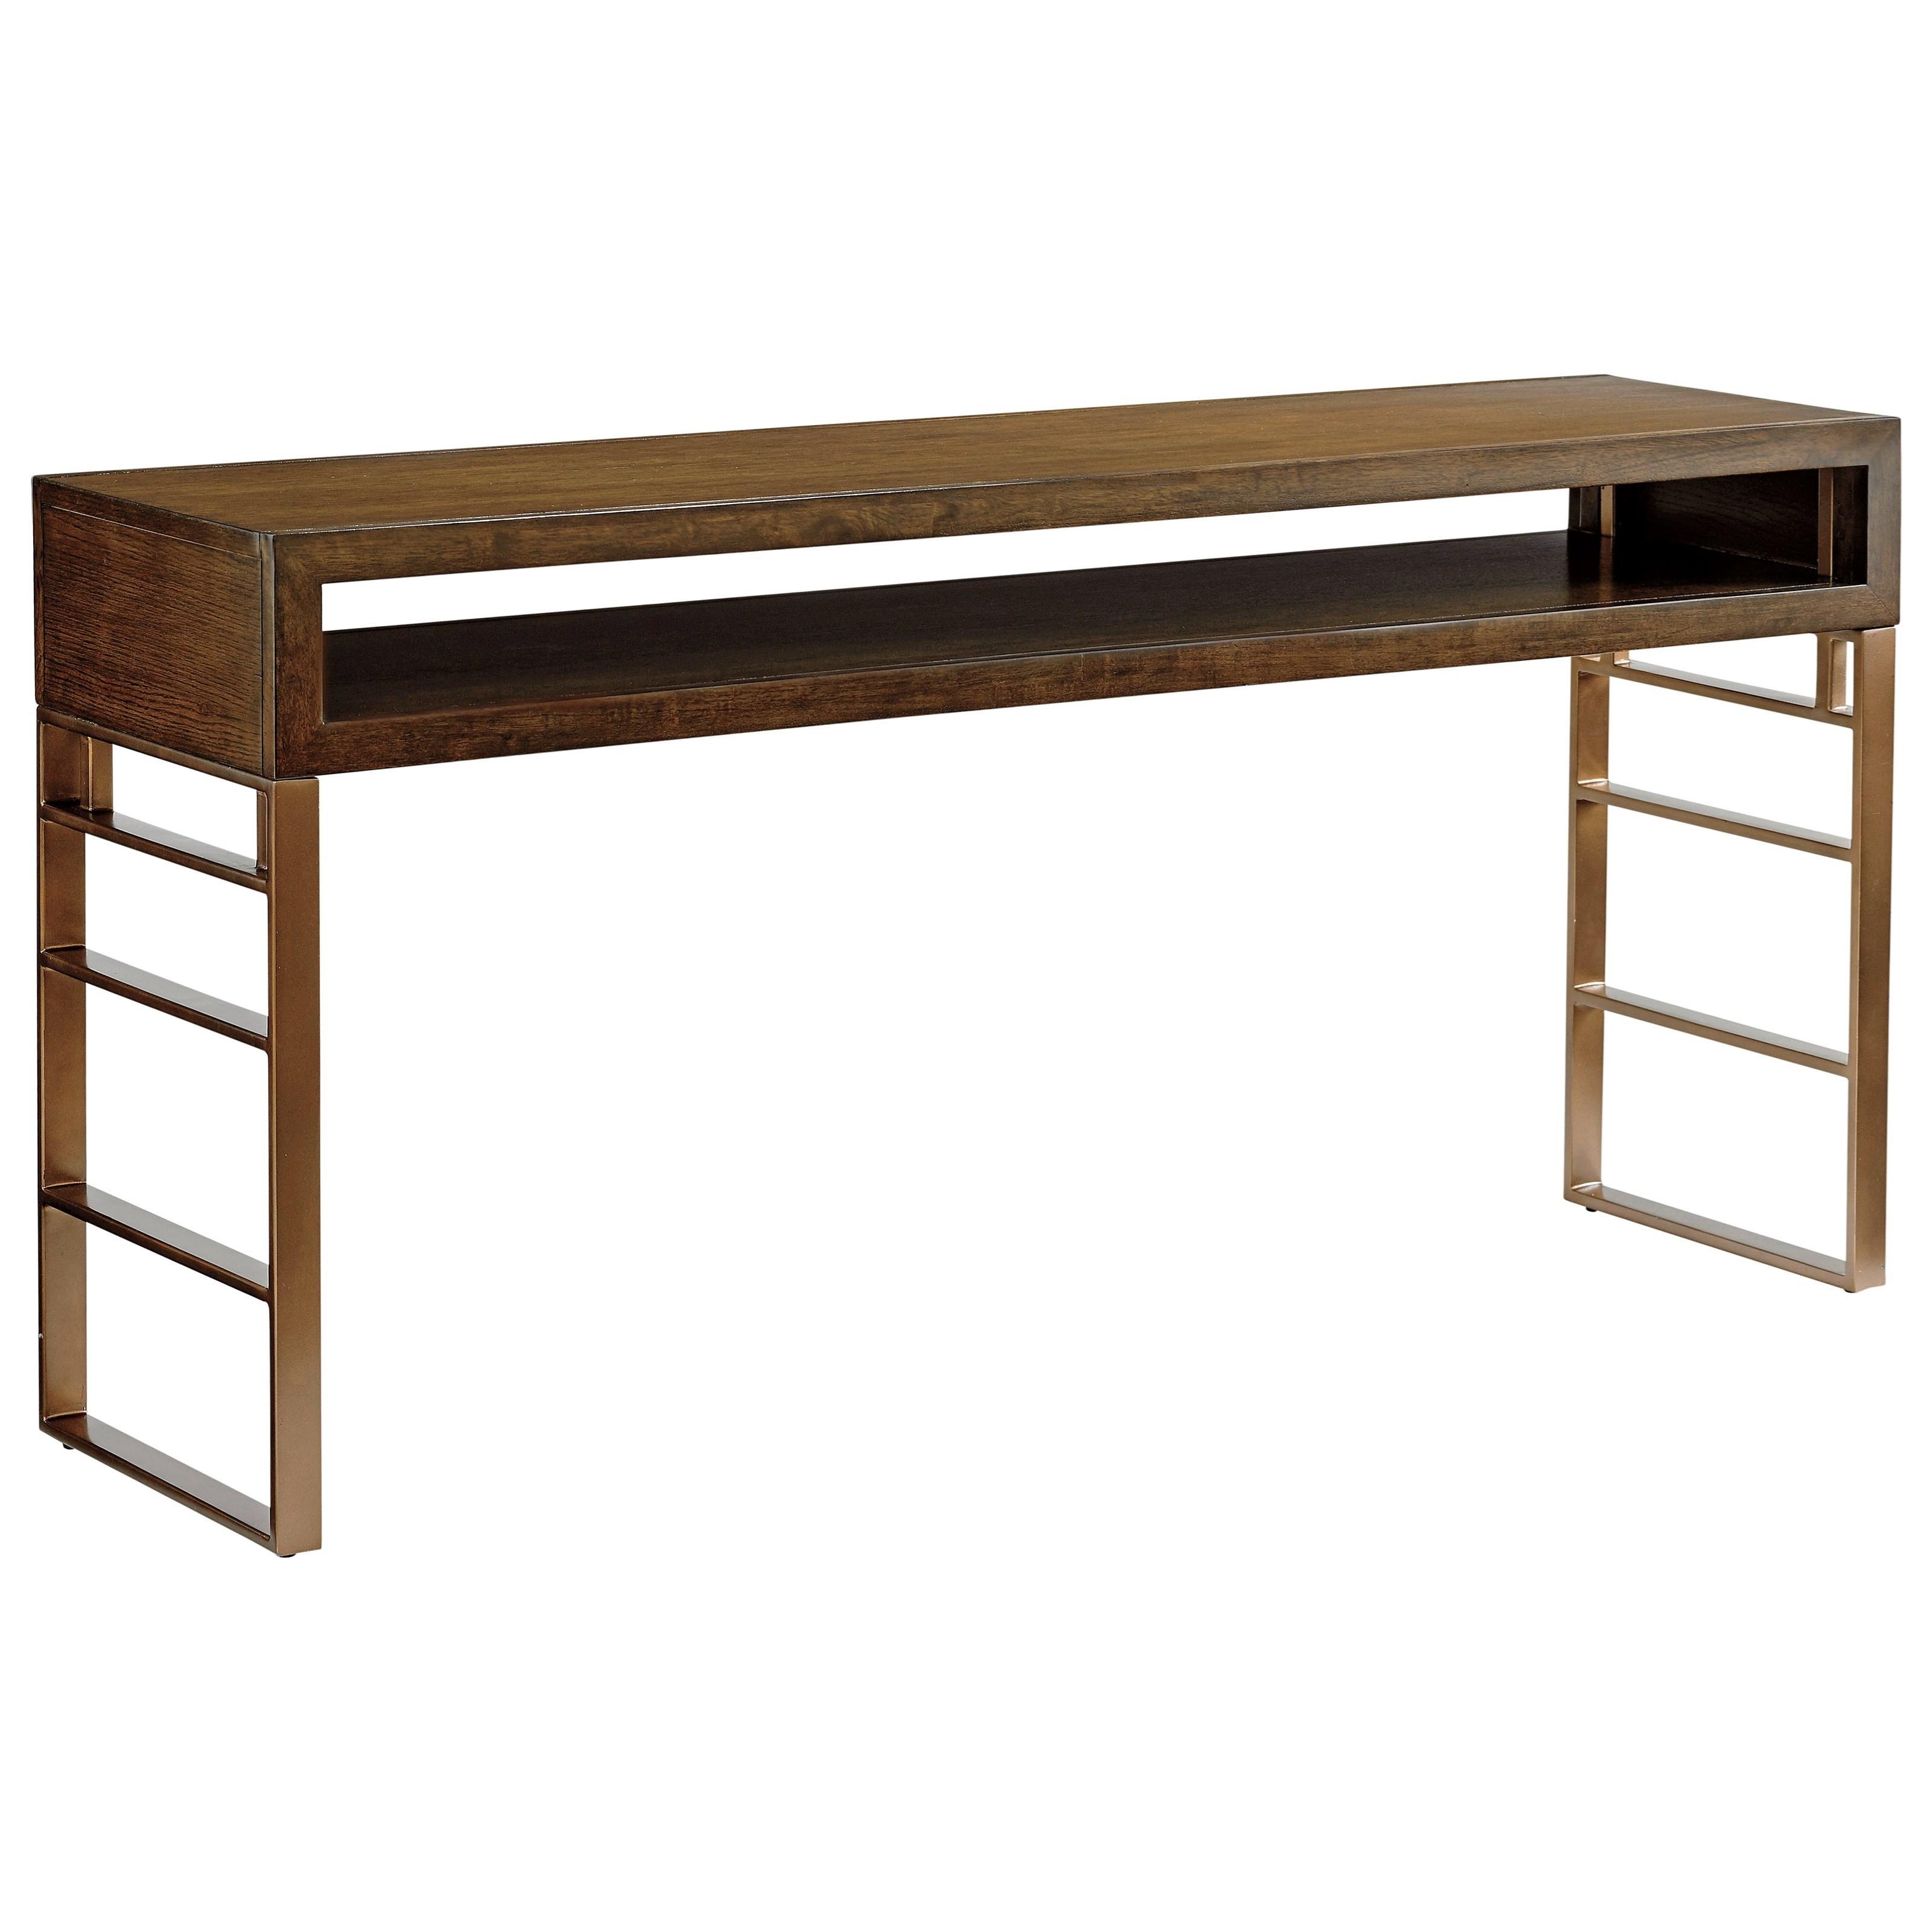 Sligh Cross Effect Contemporary Office Console With Metal Base   John V  Schultz Furniture   Table Desks/Writing Desks